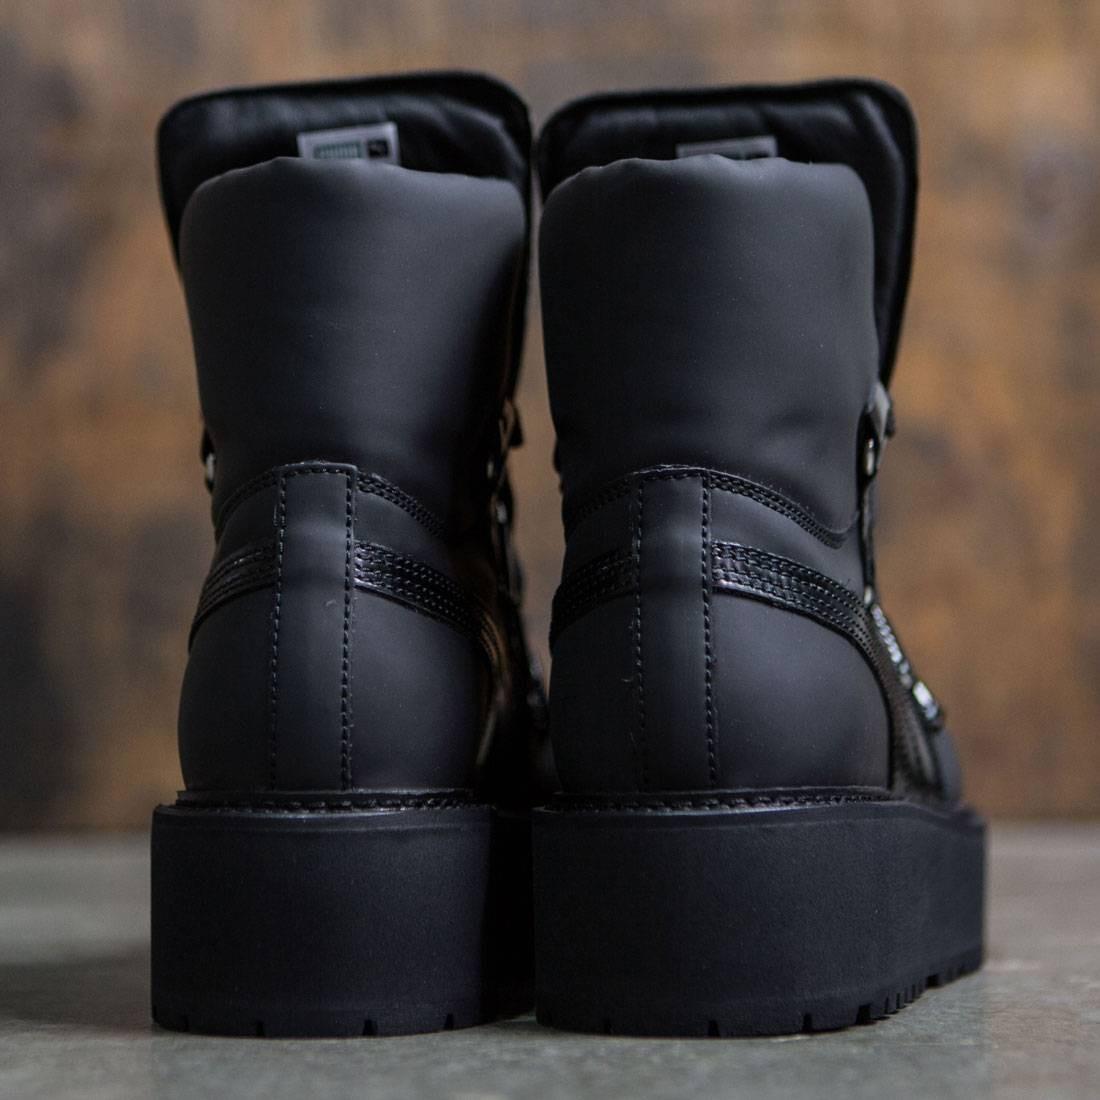 Puma SB Eyelet Rihanna Puma Black Black Black | Footshop